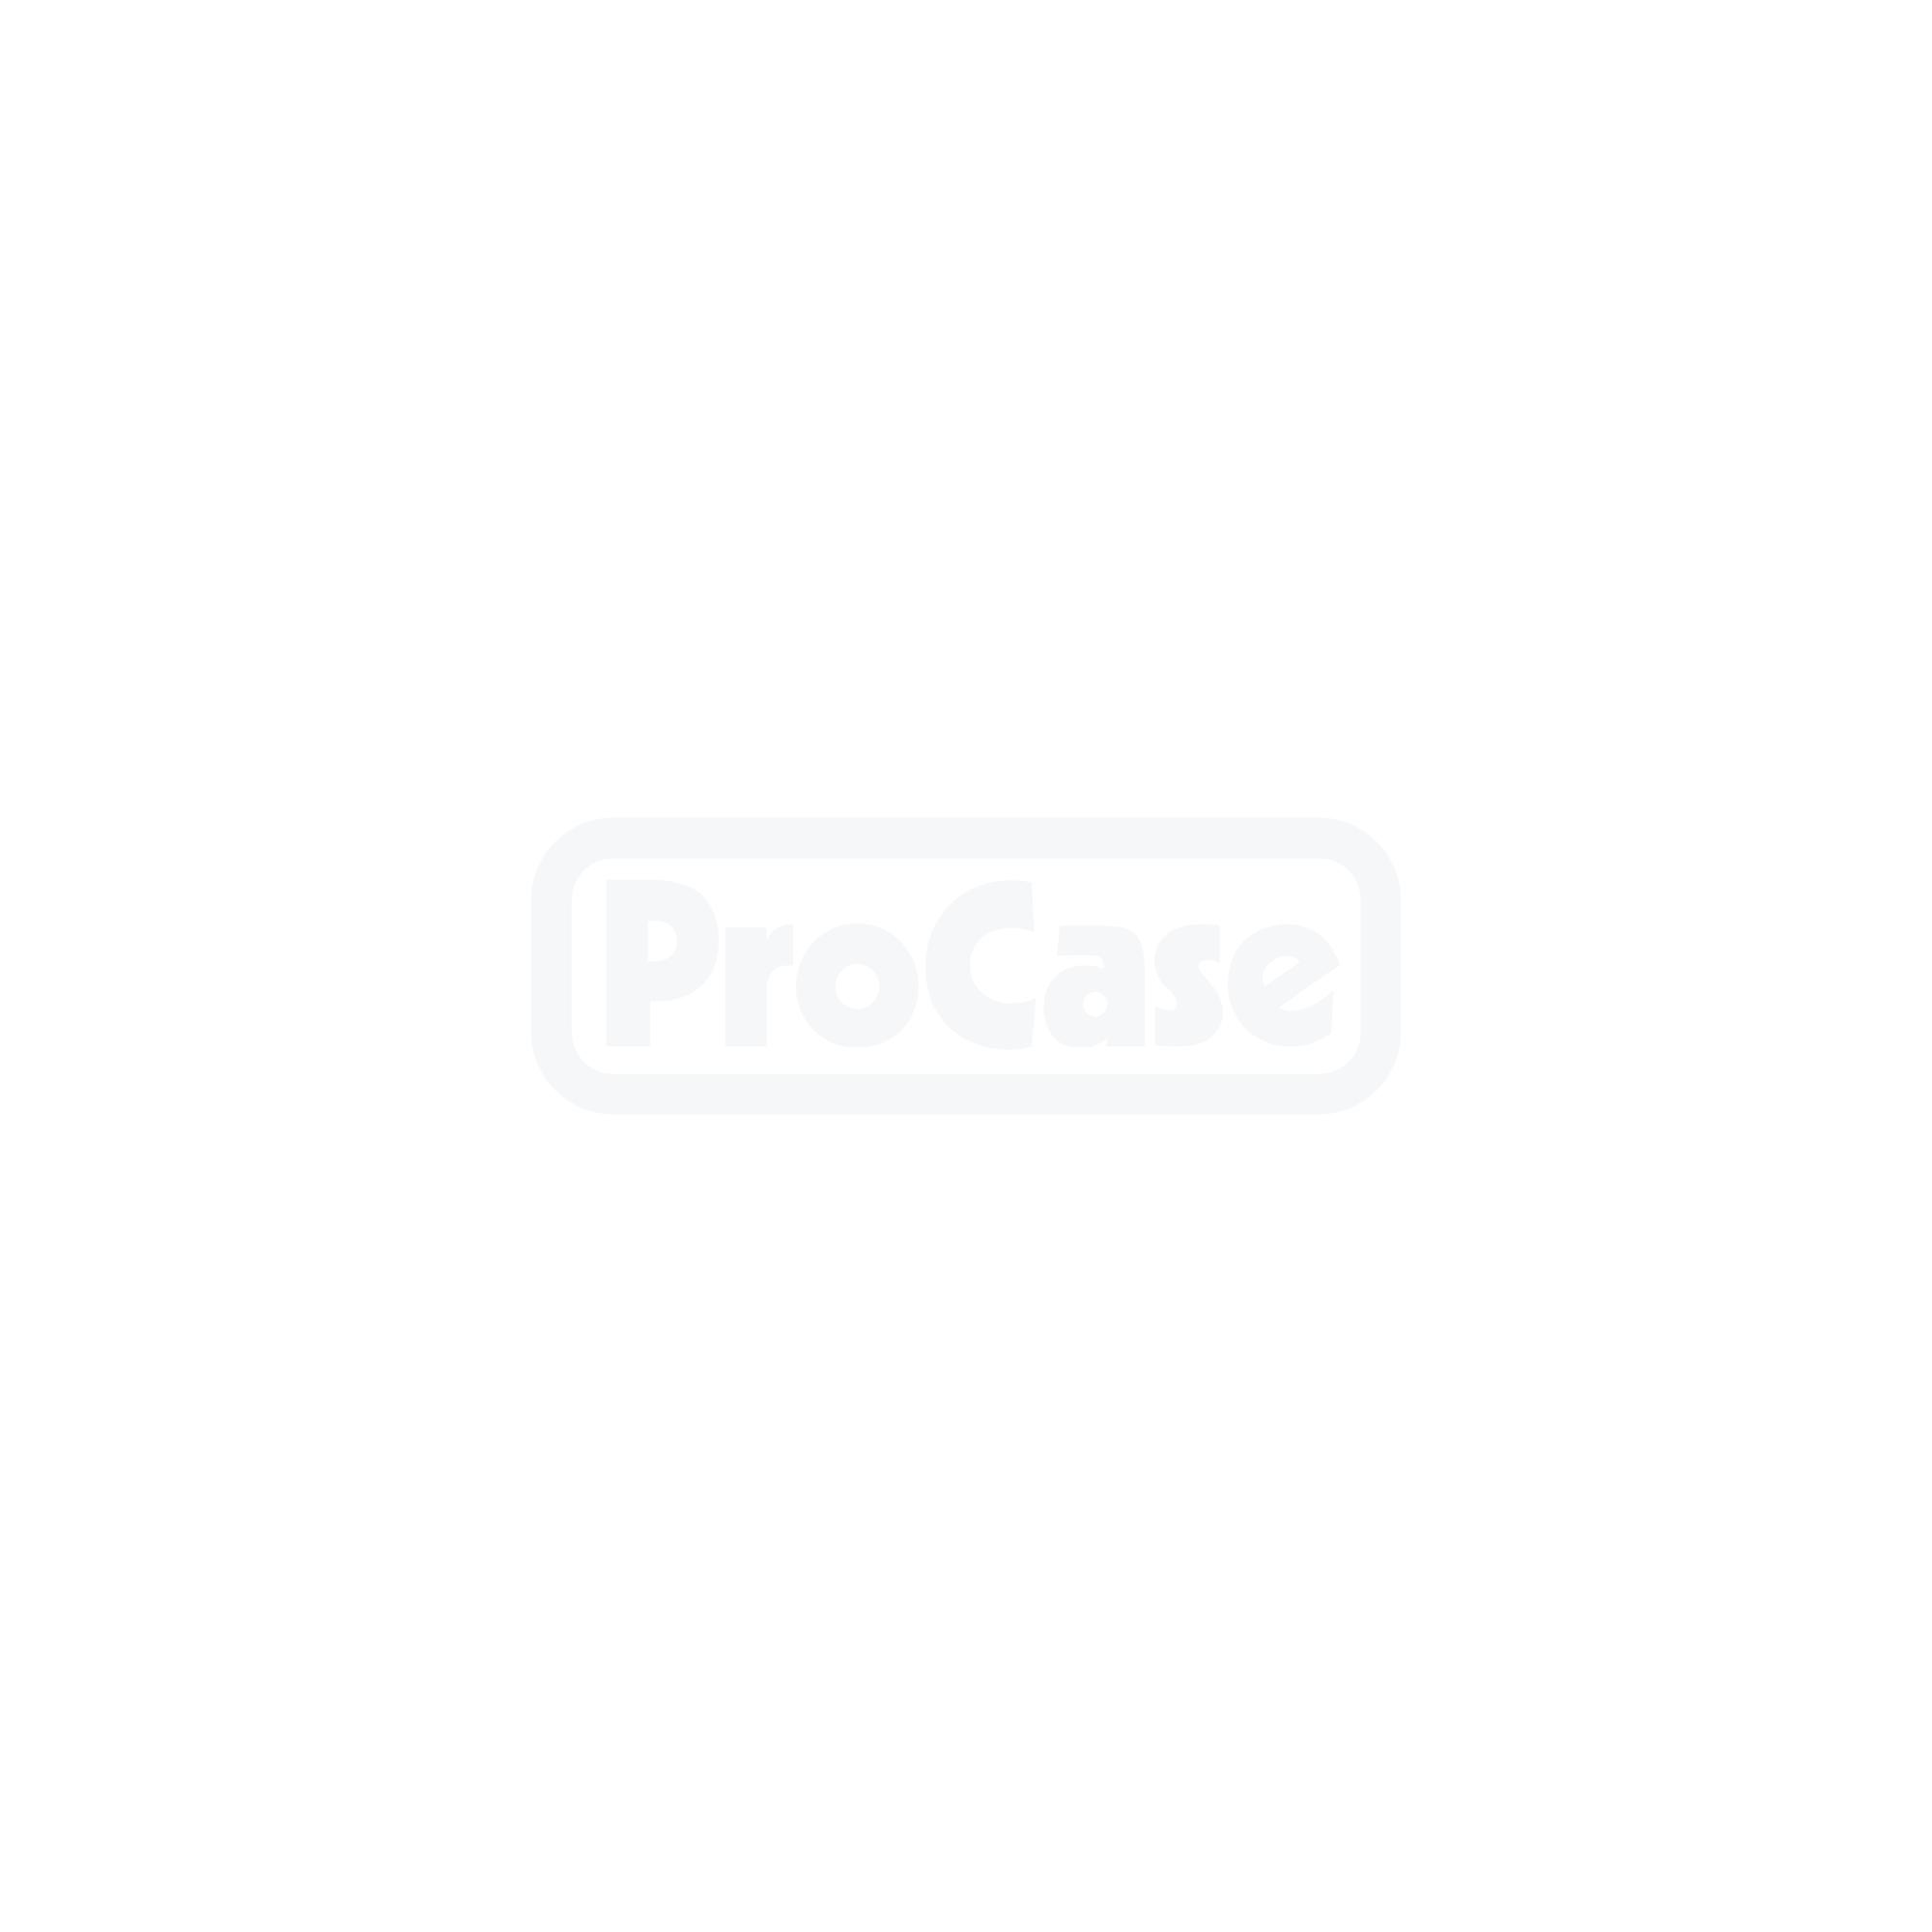 Flightcase für 6 Barco iLite LED-Module 2